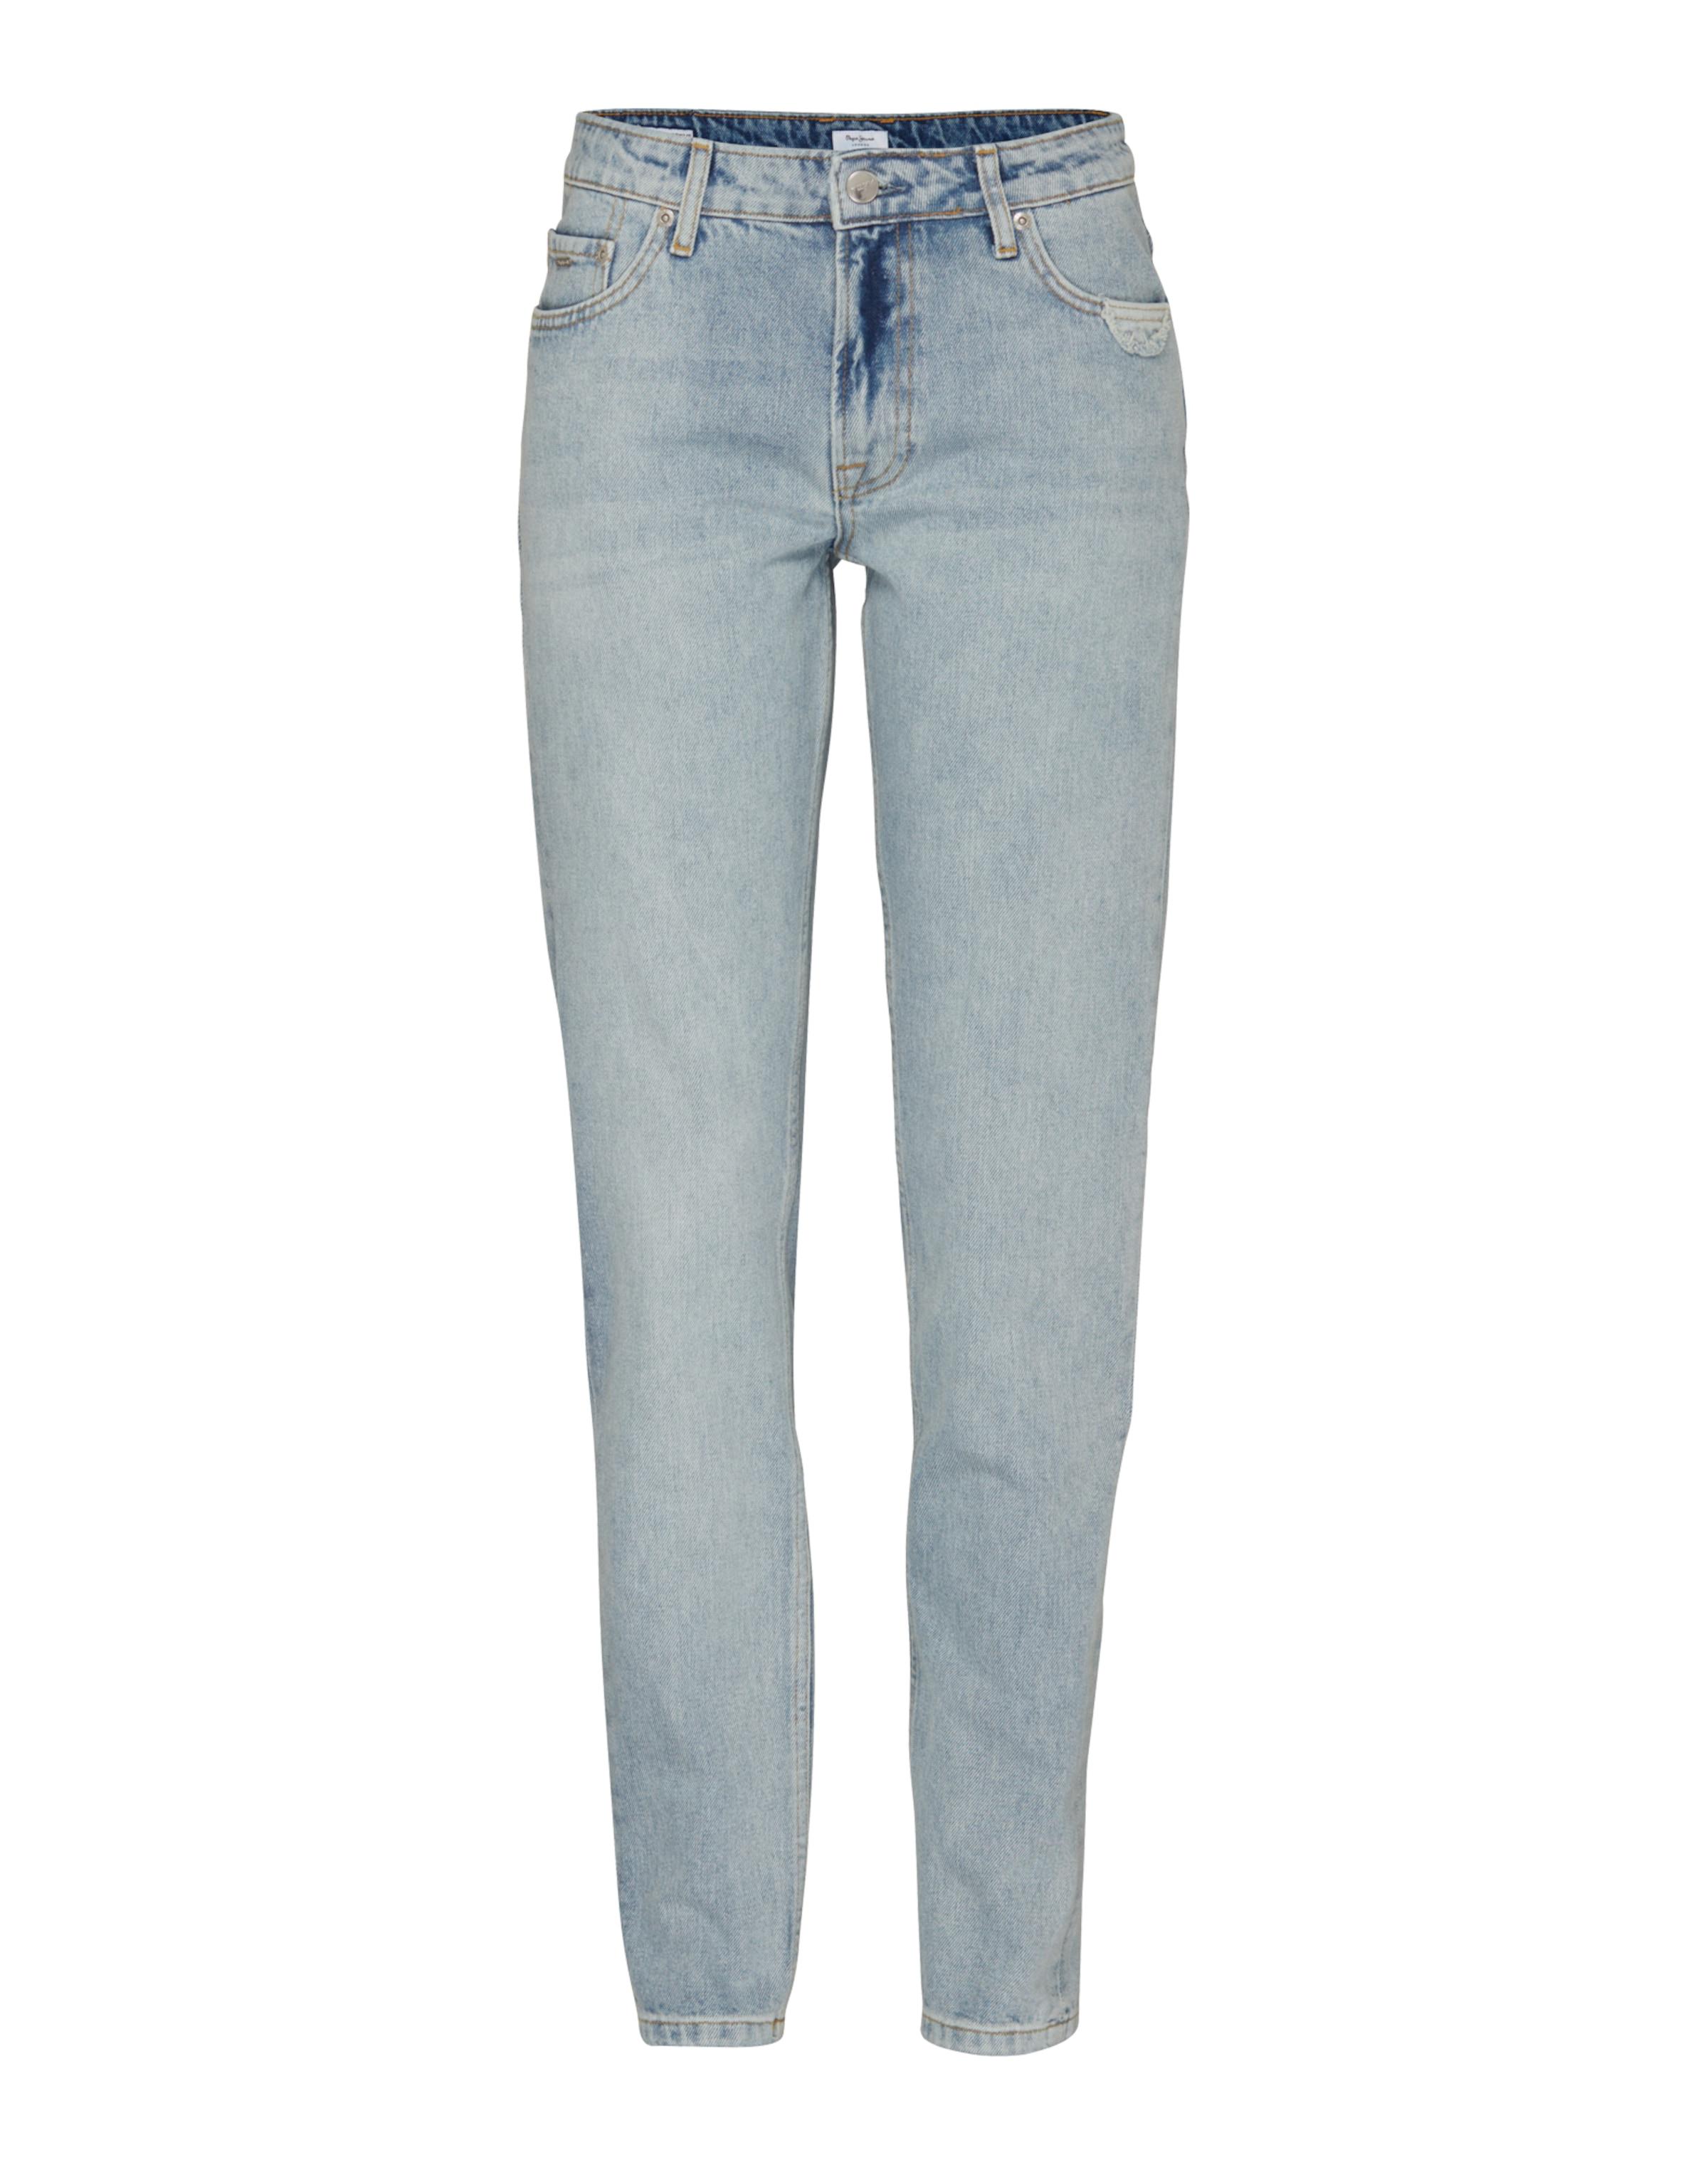 Pepe Jeans 'Heidi' Tapered Denim Günstige Online sQ5C9K